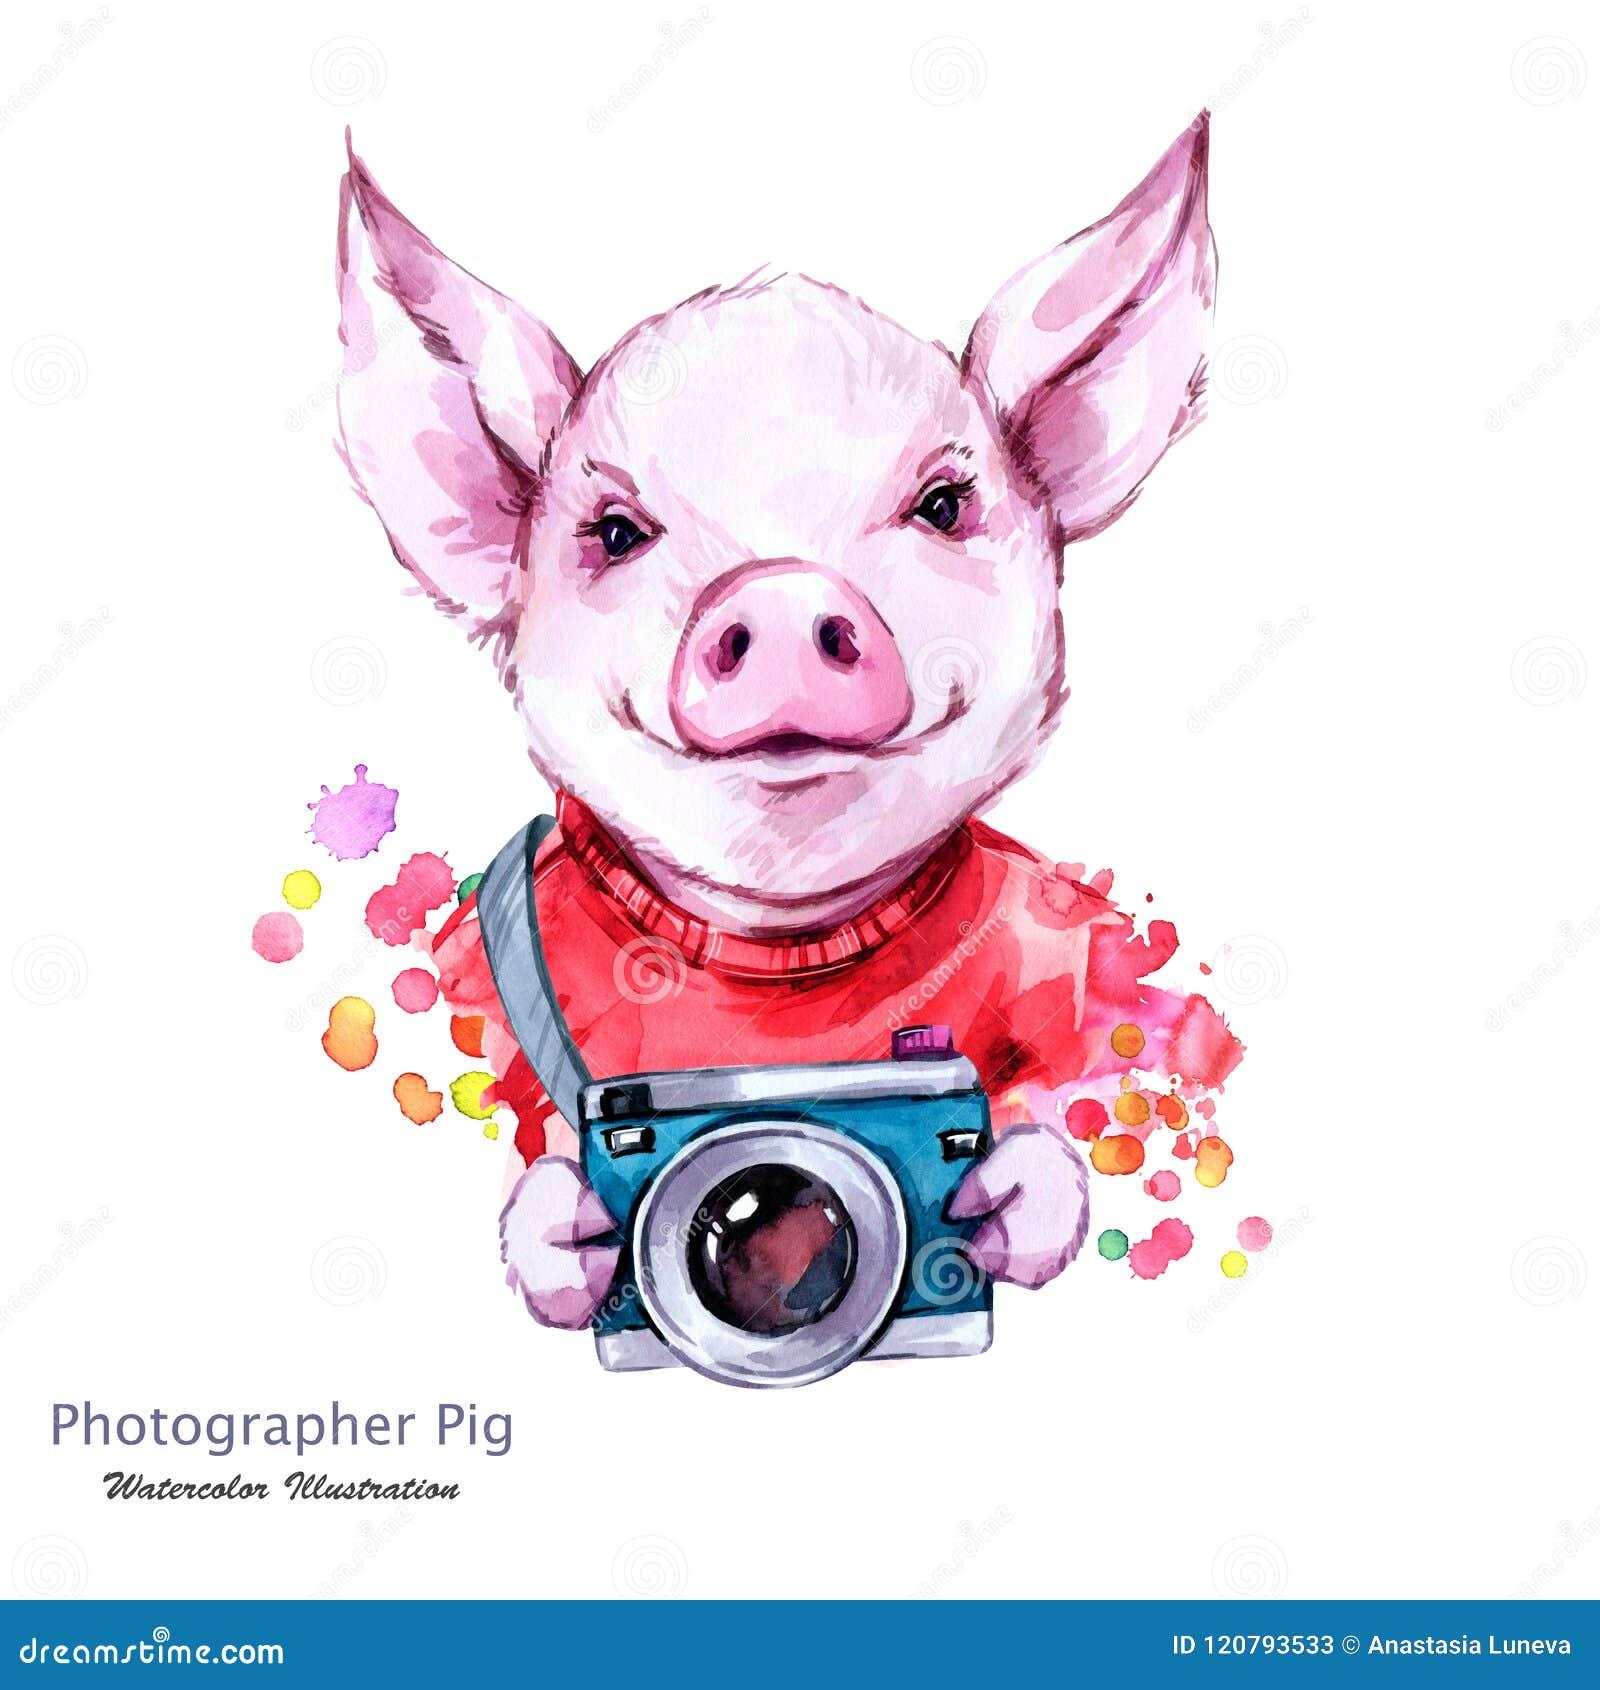 Summer Holidays Illustration  Watercolor Cartoon Pig With